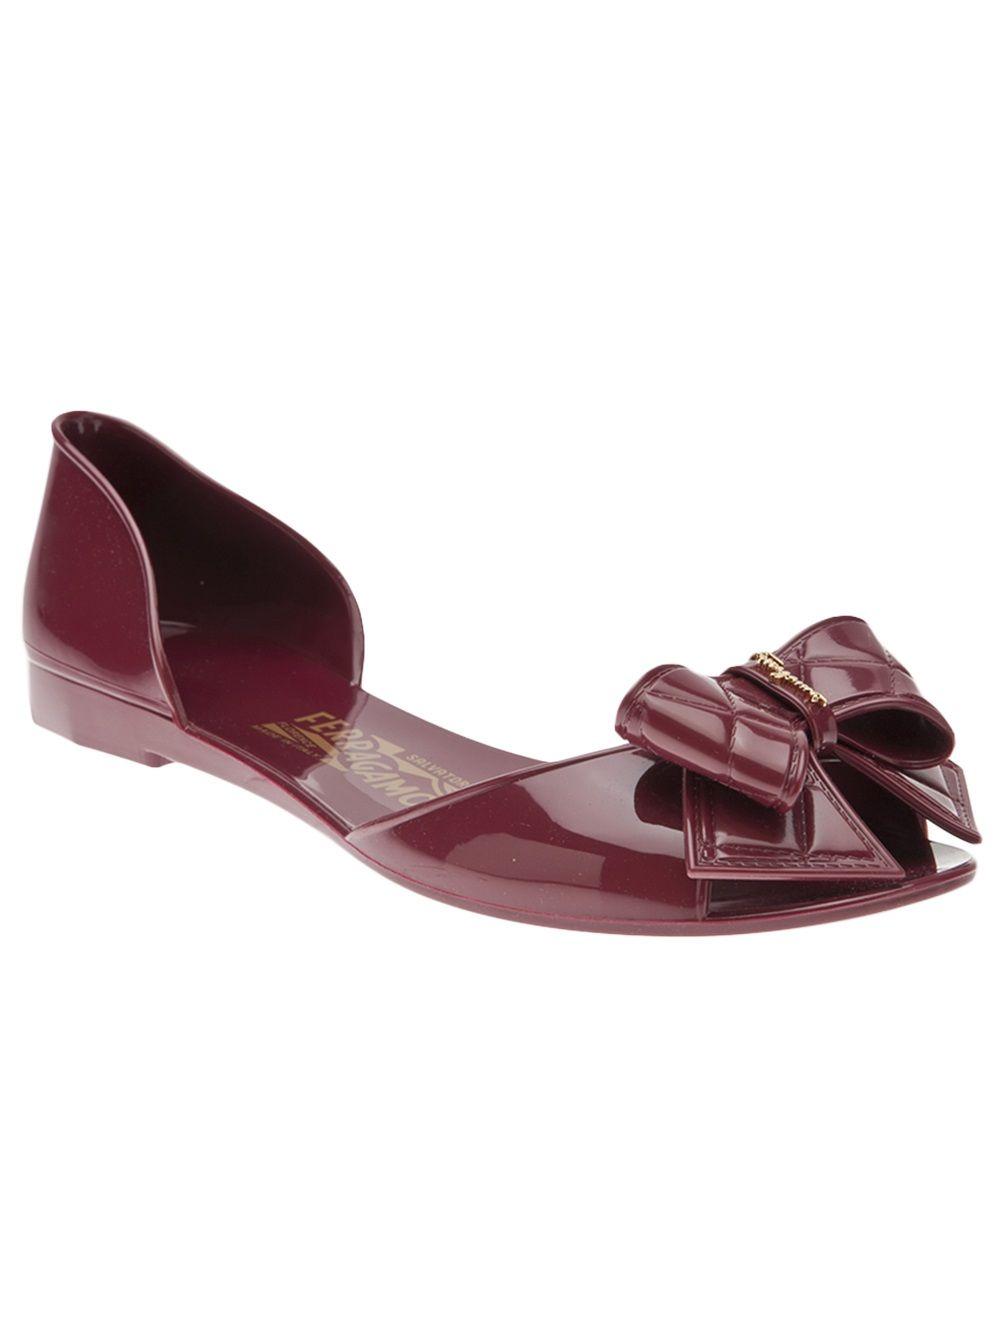 c66db0806 Salvatore Ferragamo Jelly Flat - Hu s Shoes - Farfetch.com